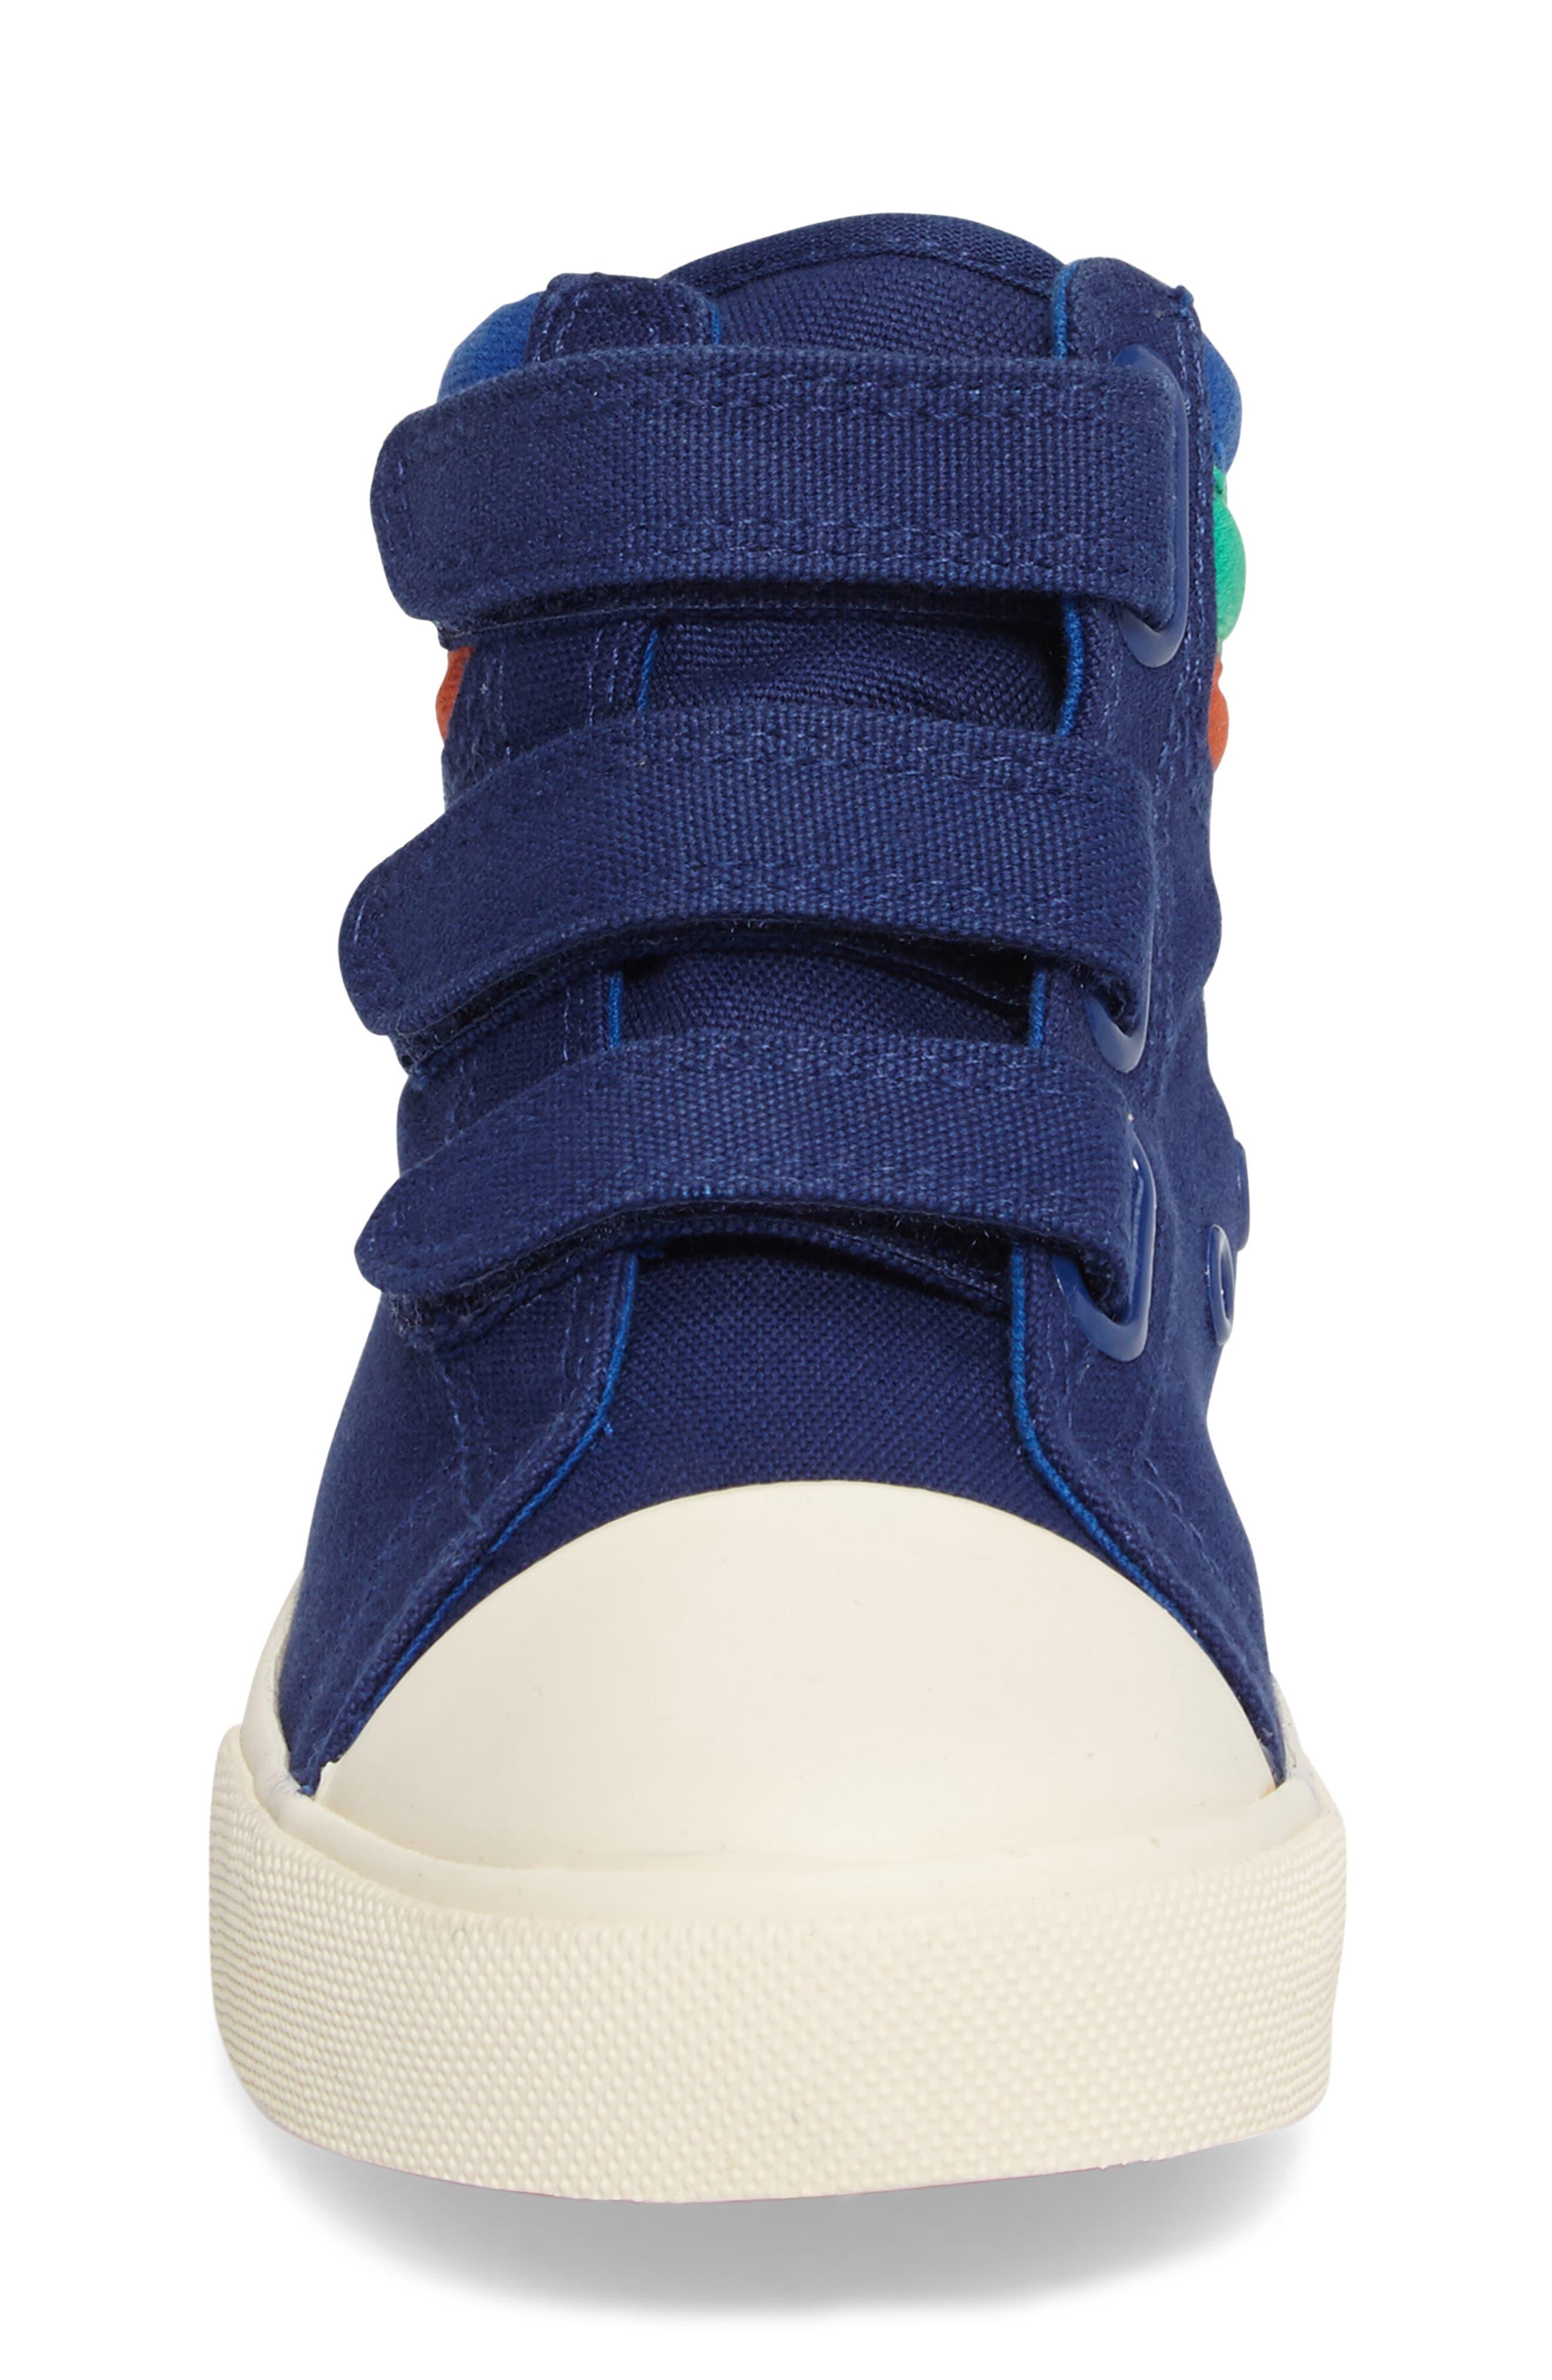 Alternate Image 4  - Mini Boden High Top Sneaker (Toddler, Little Kid & Big Kid)